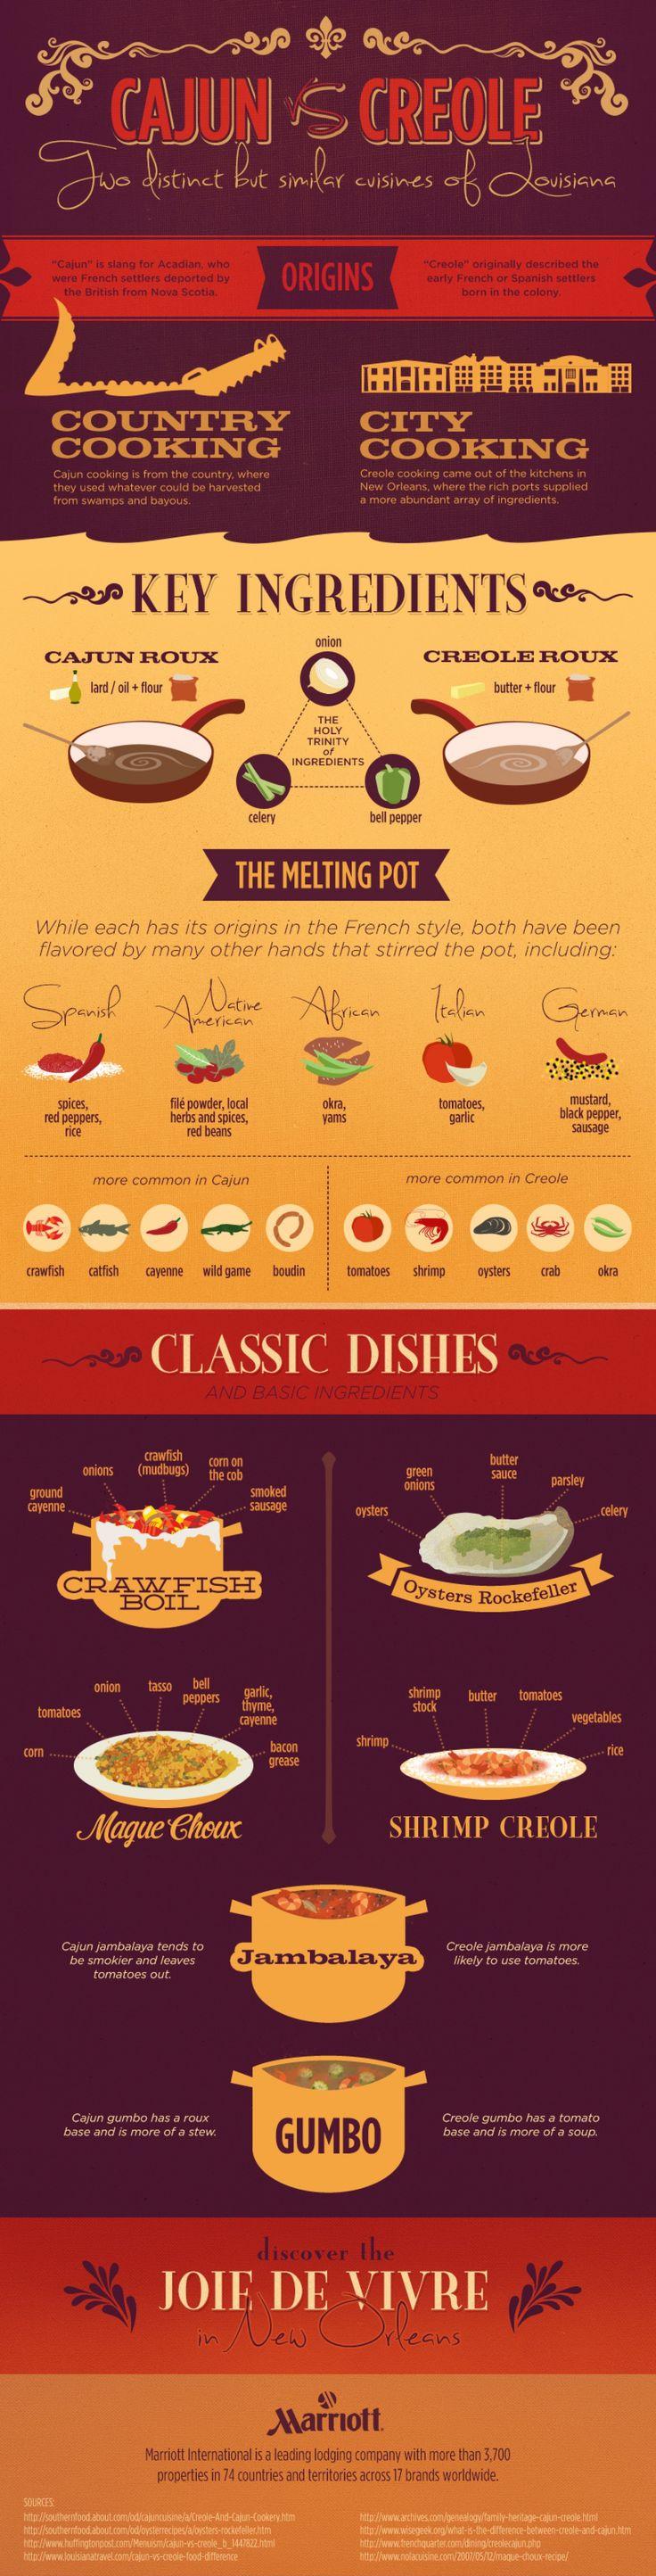 New Orleans Cuisine: Cajun vs. Creole Food Infographic